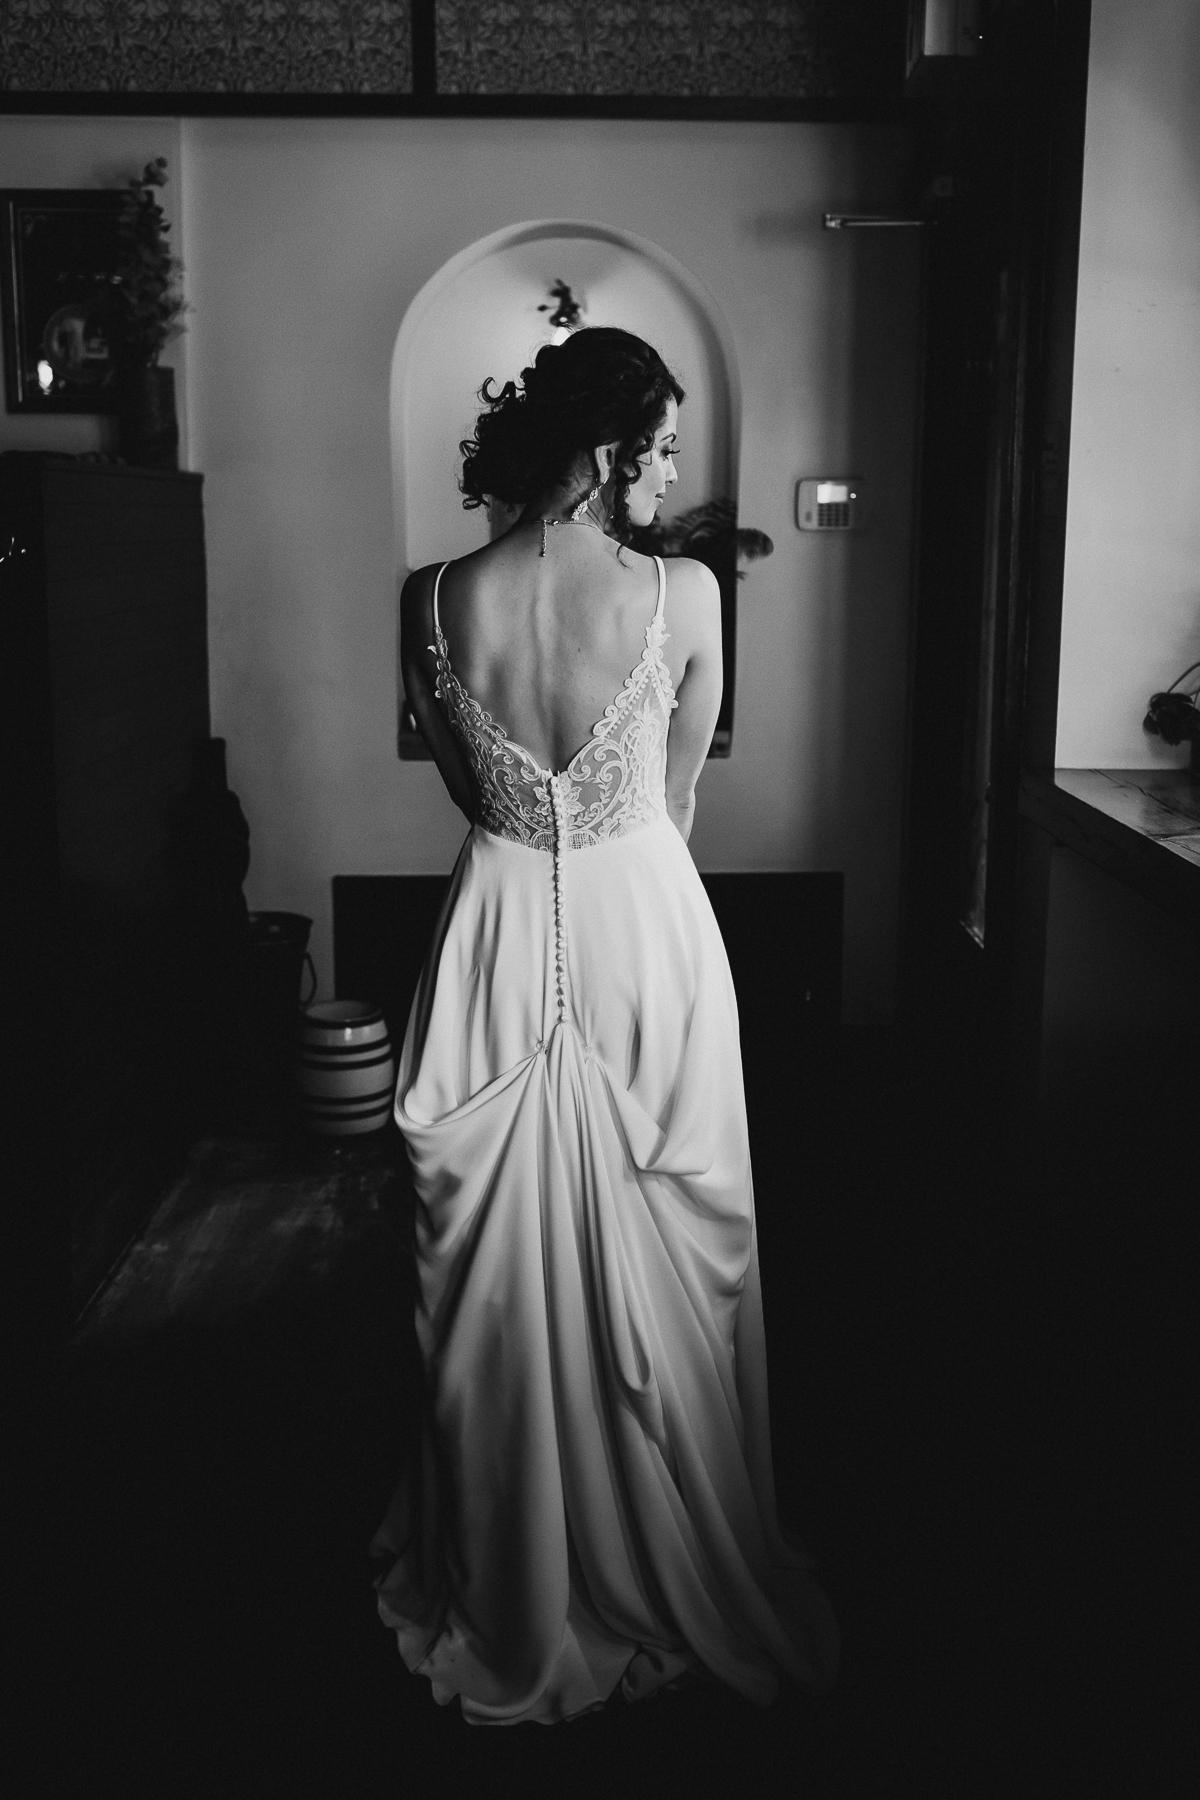 Humboldt-&-Jackson-Restaurant-Intimate-Brooklyn-Documentary-Wedding-Photographer-81.jpg